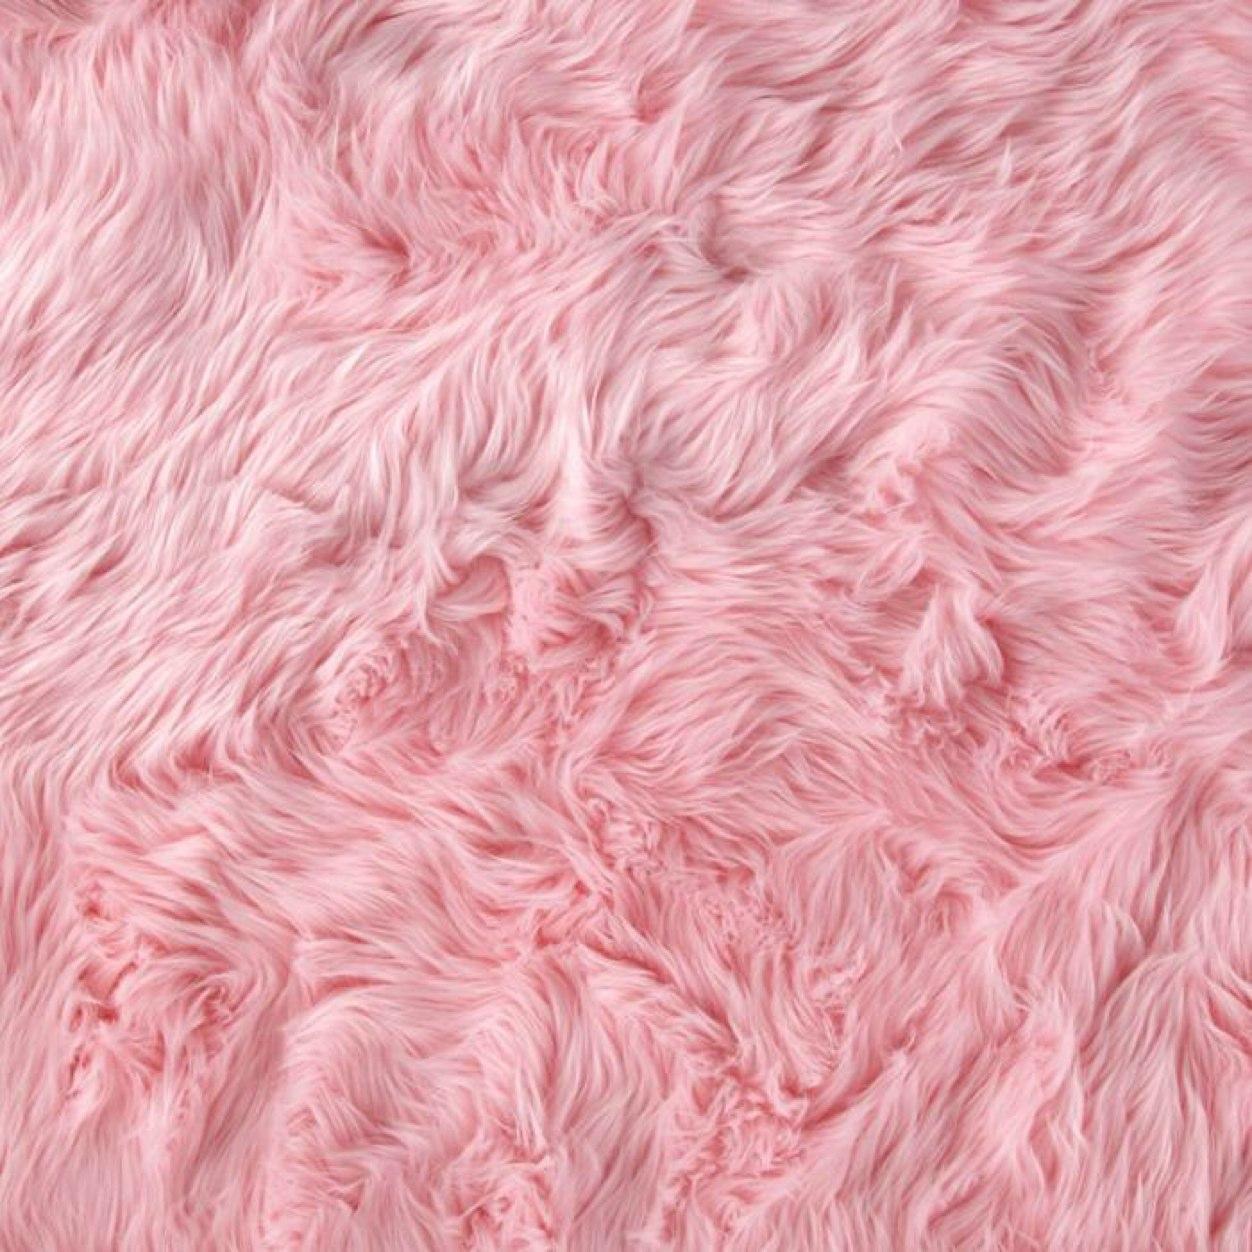 Pink fur google pinterest fur for Fur wallpaper tumblr